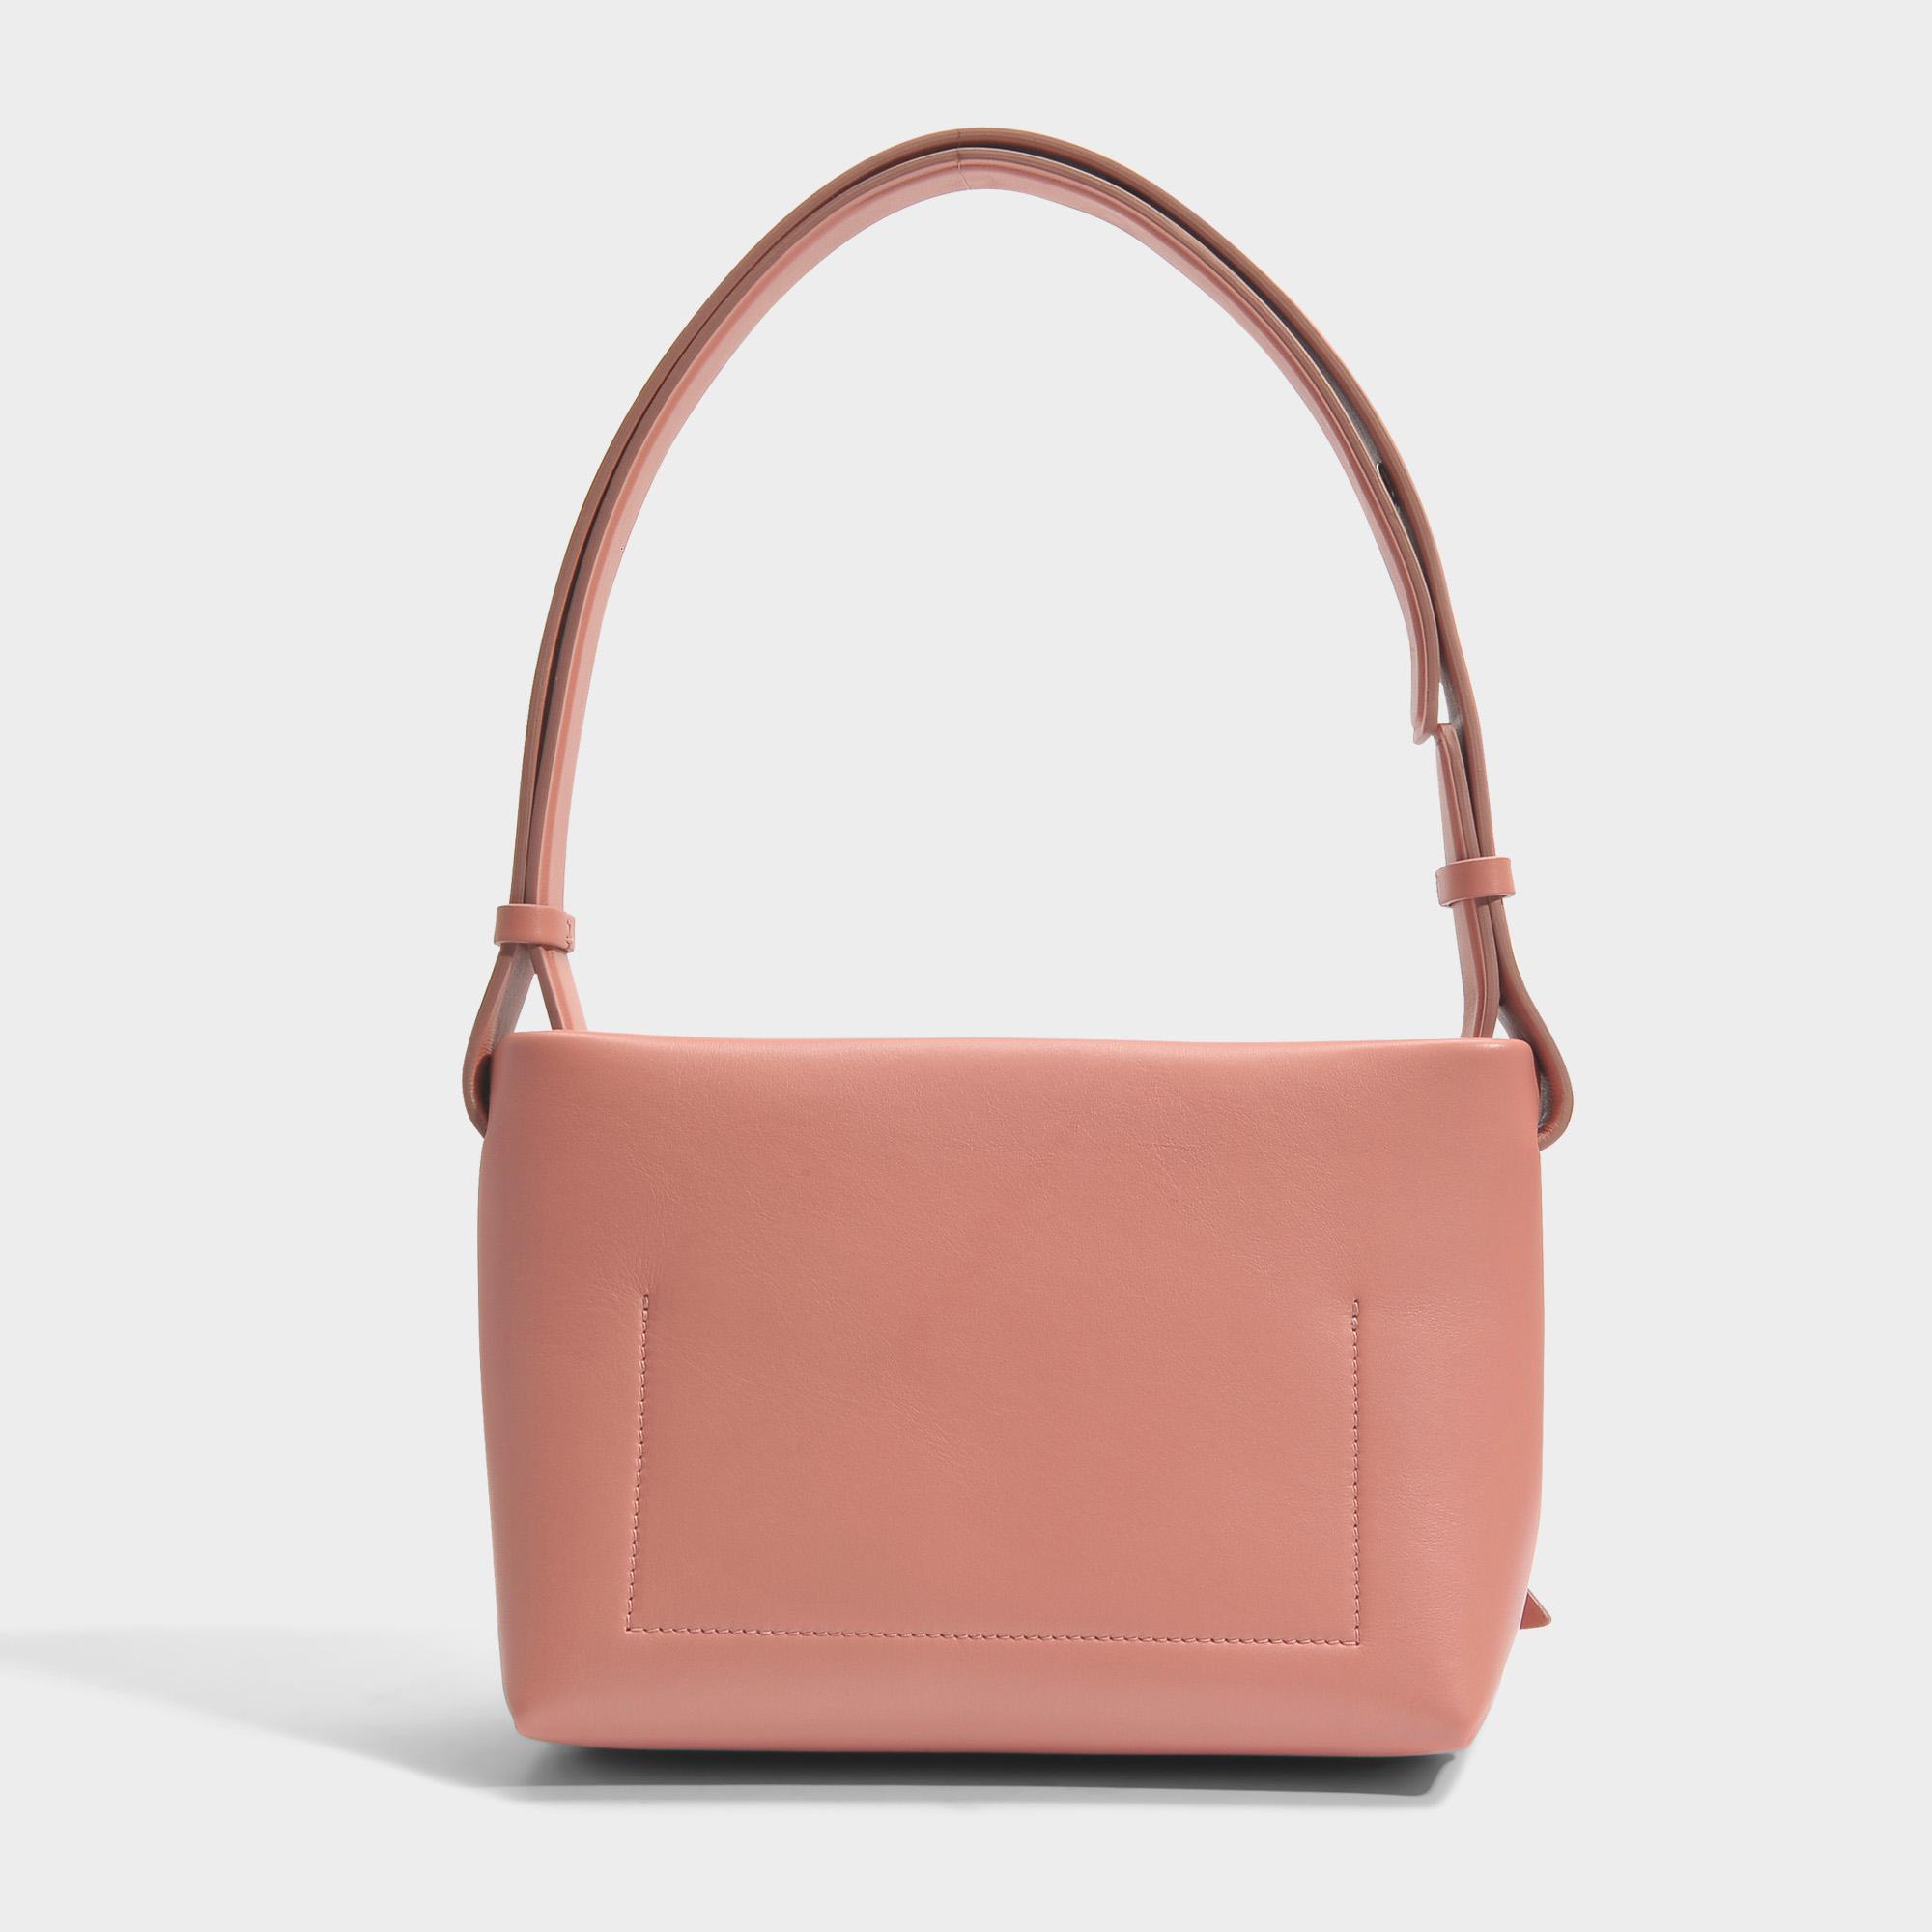 e195e032e3 Acne Studios Musubi Handbag In Pink Calf And Lamb Leather - Lyst